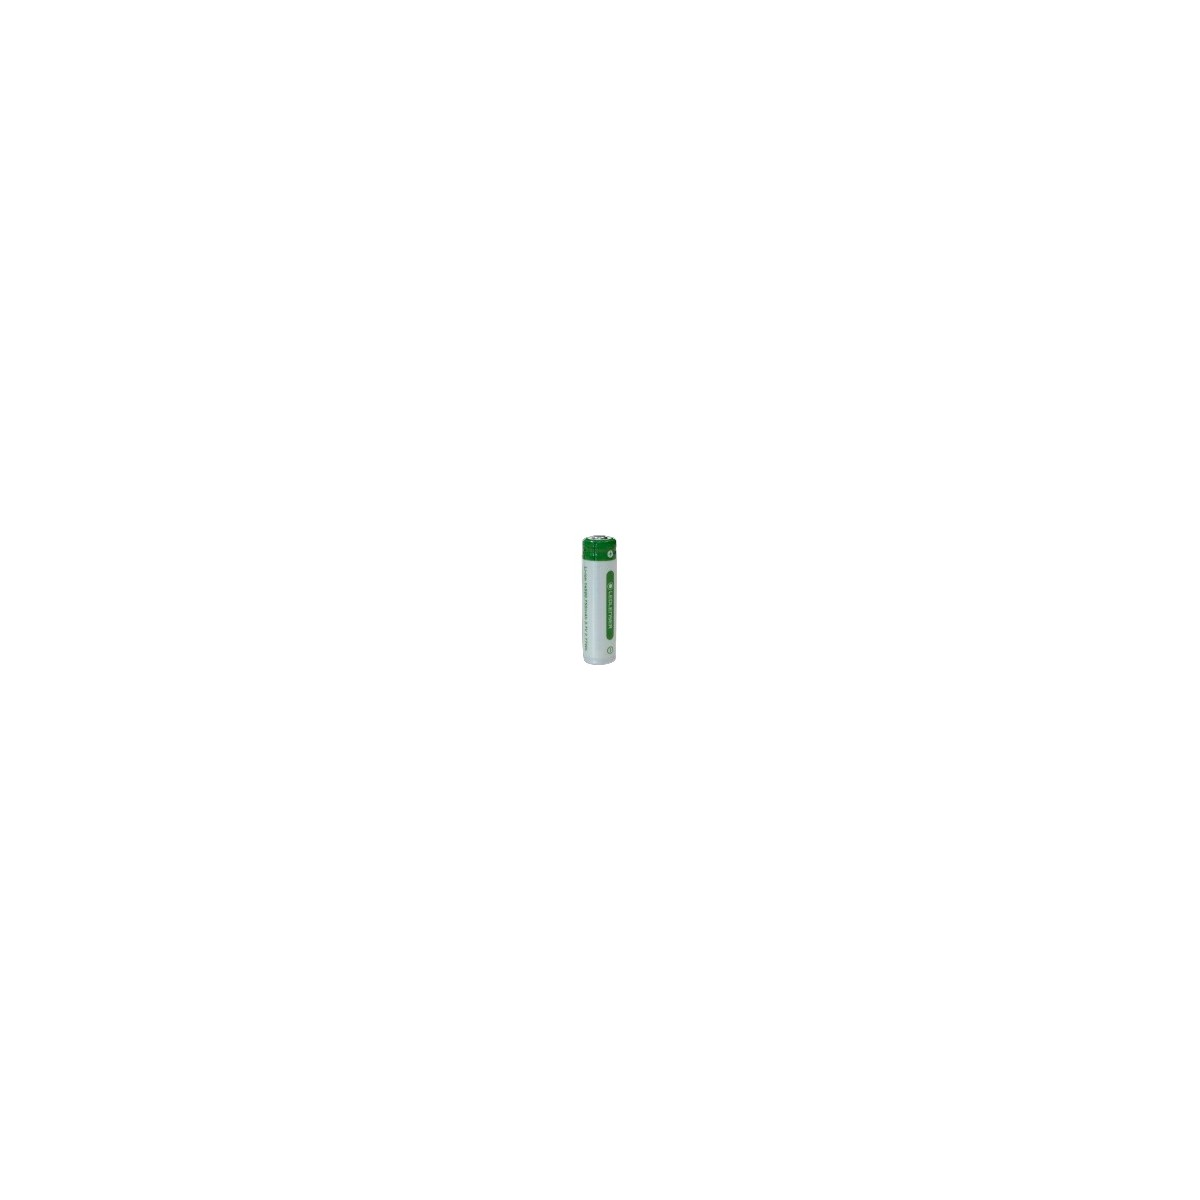 Batería 14500 Li-Ion 750 MAH 3,7V para frontal MH3, MH4 y MH5